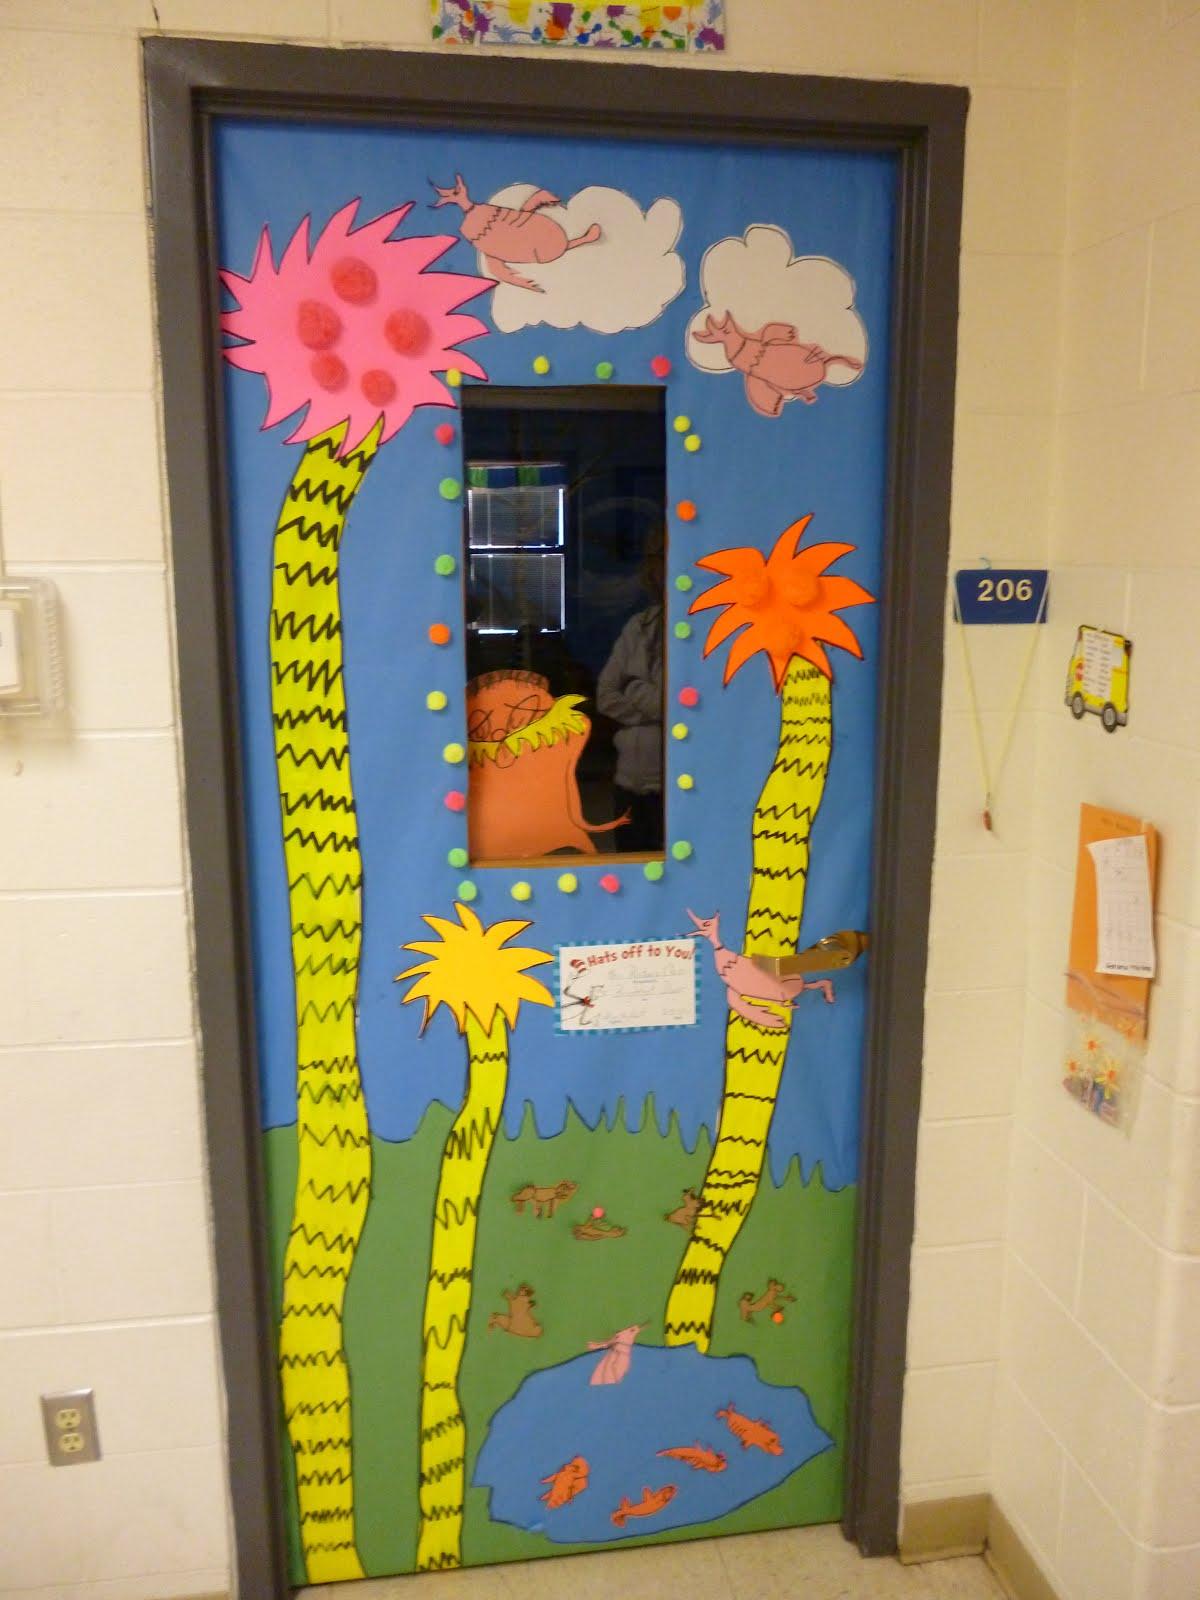 Seuss Door Decorating Results on Dr Seuss Bulletin Board Display